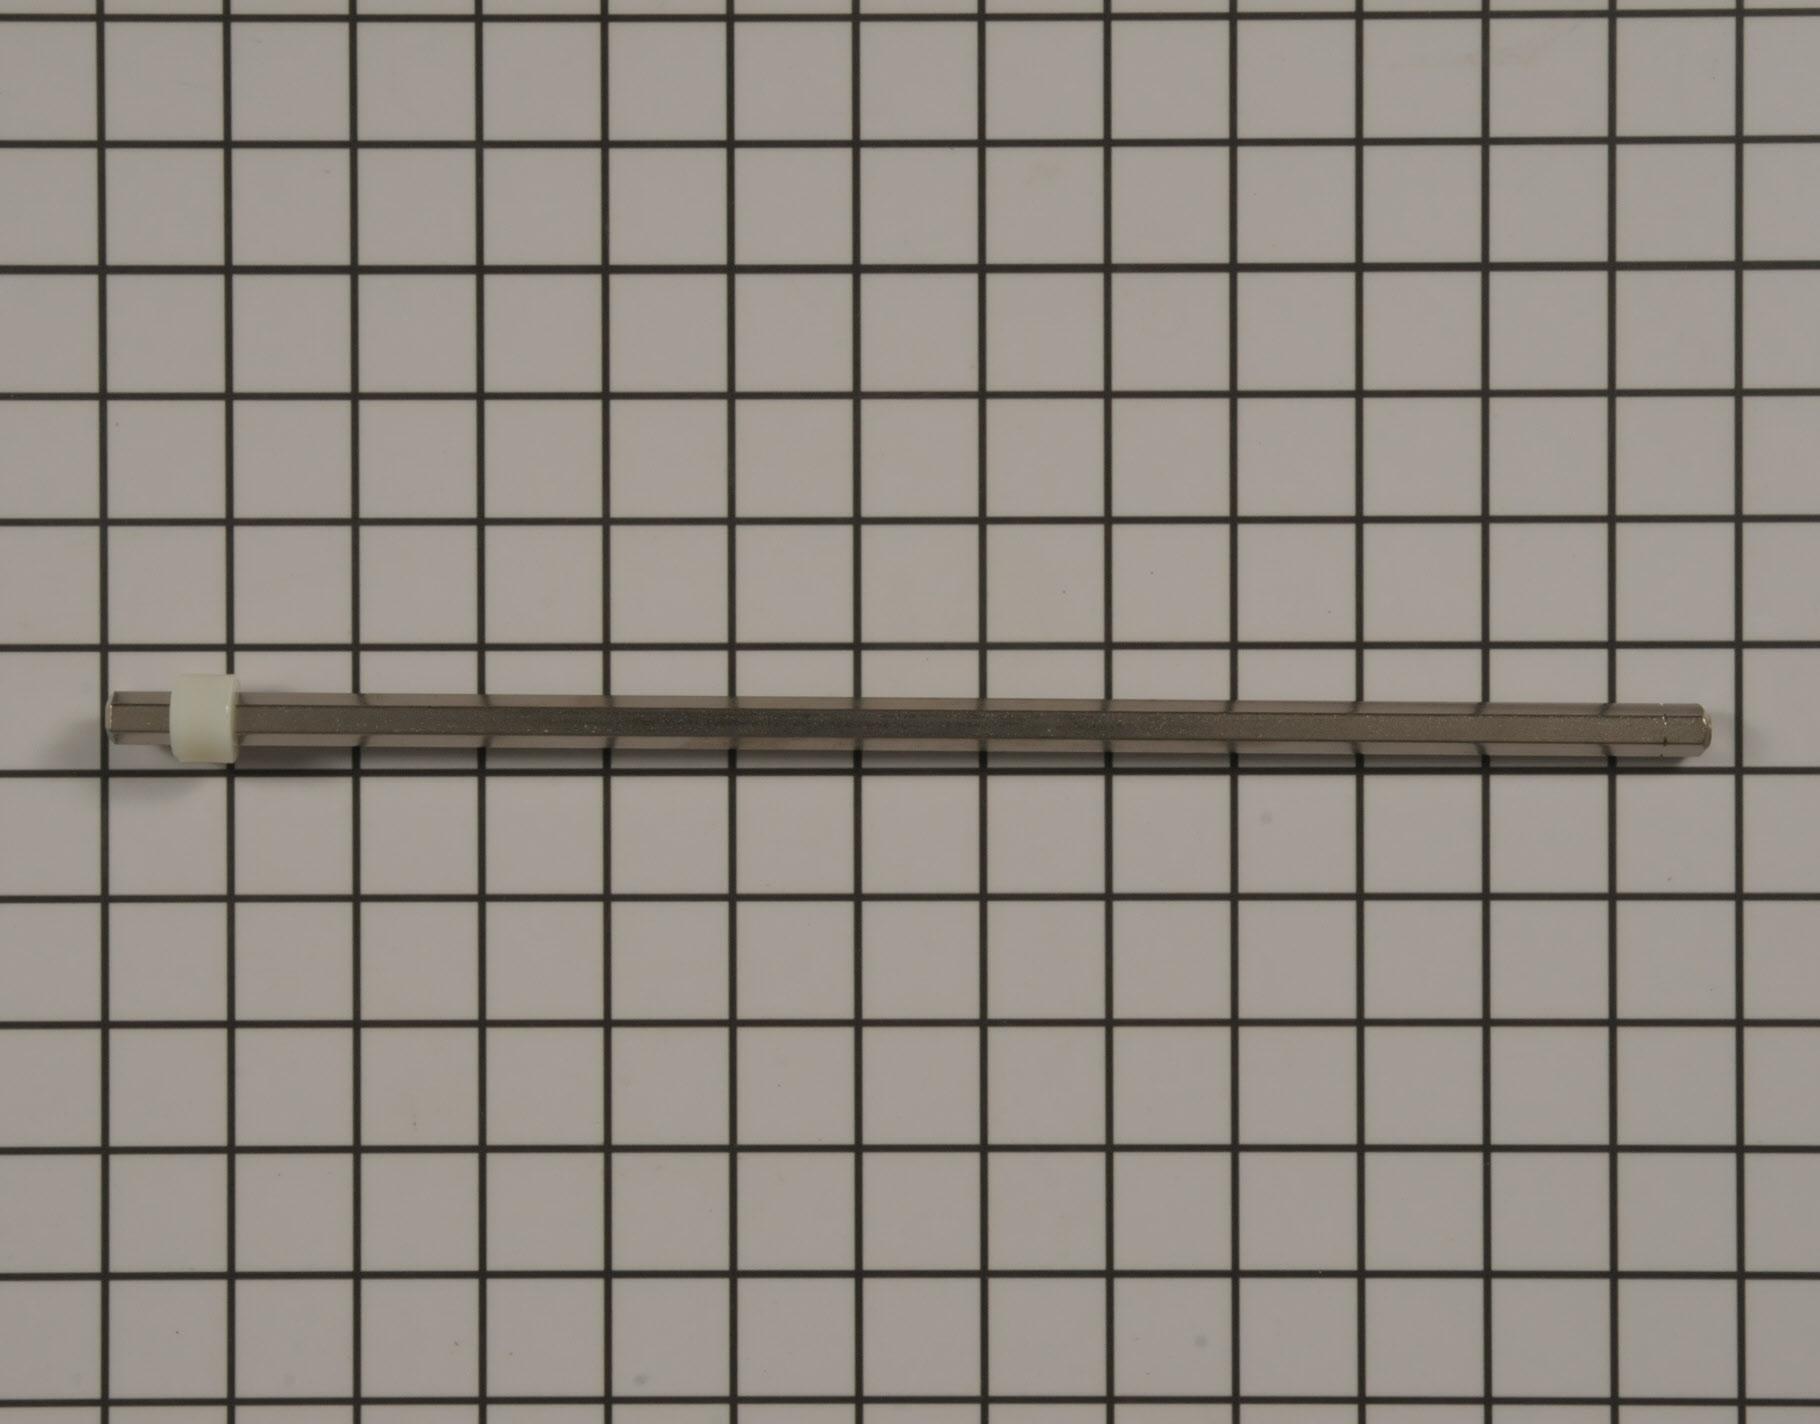 Maytag Refrigerator Part # WP2188917 - Drive Shaft